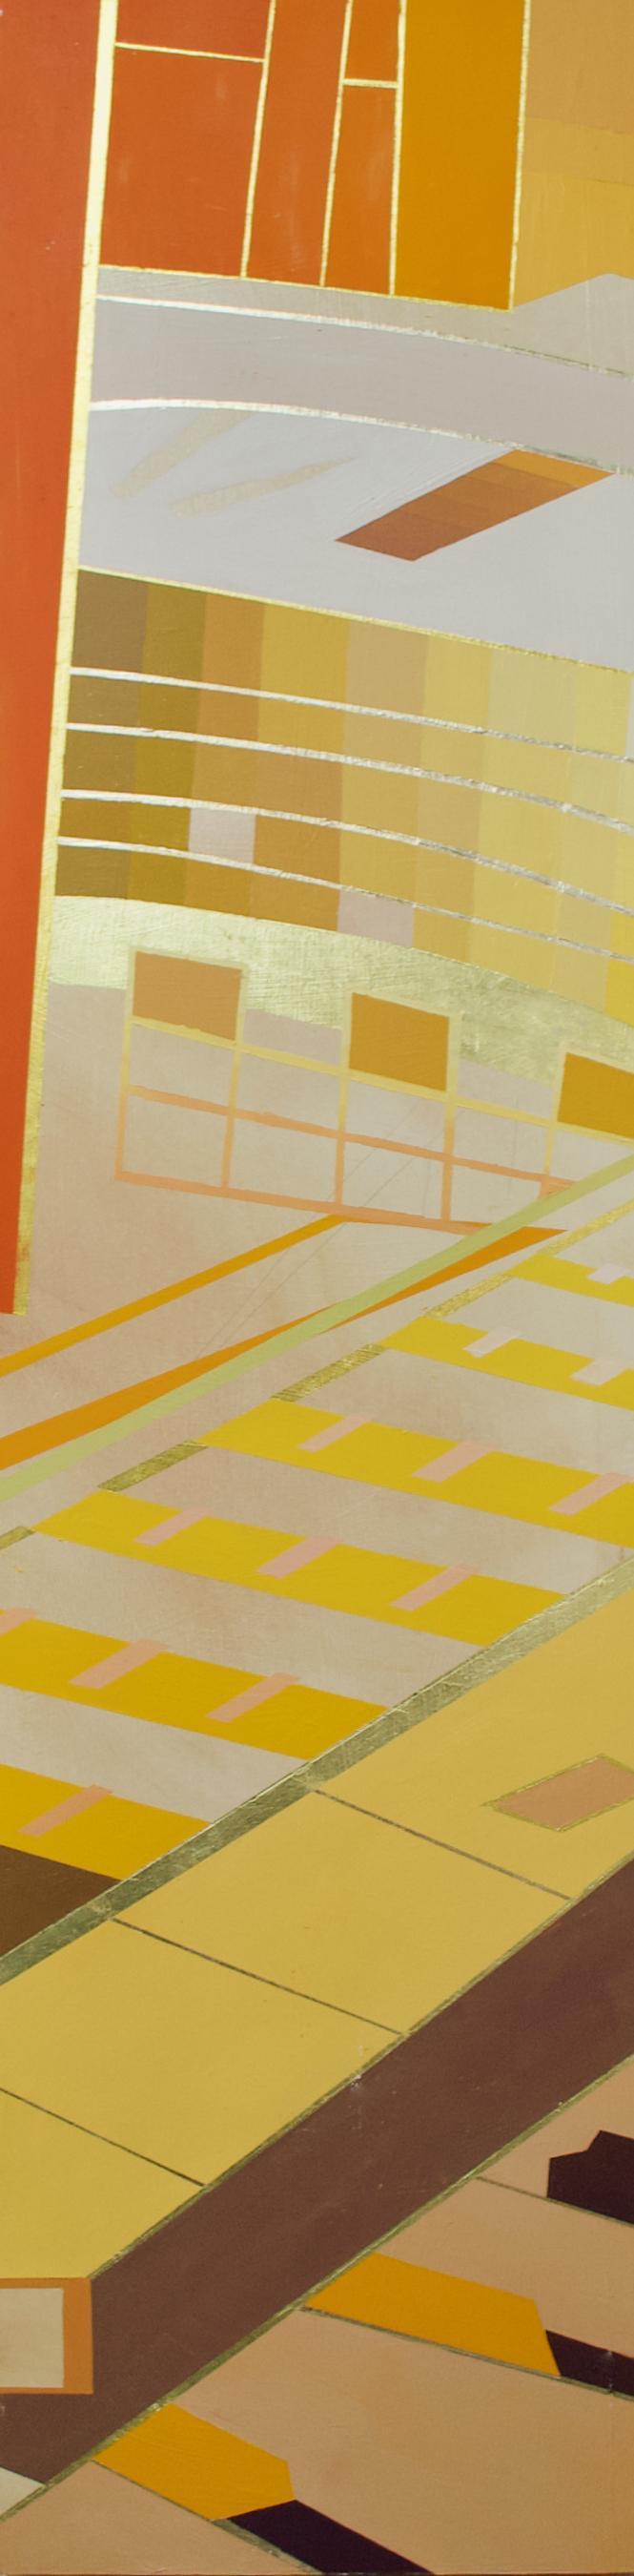 "Wonderwheel #27 - 40"" x 10"" oil and gold leaf on panel$1300"